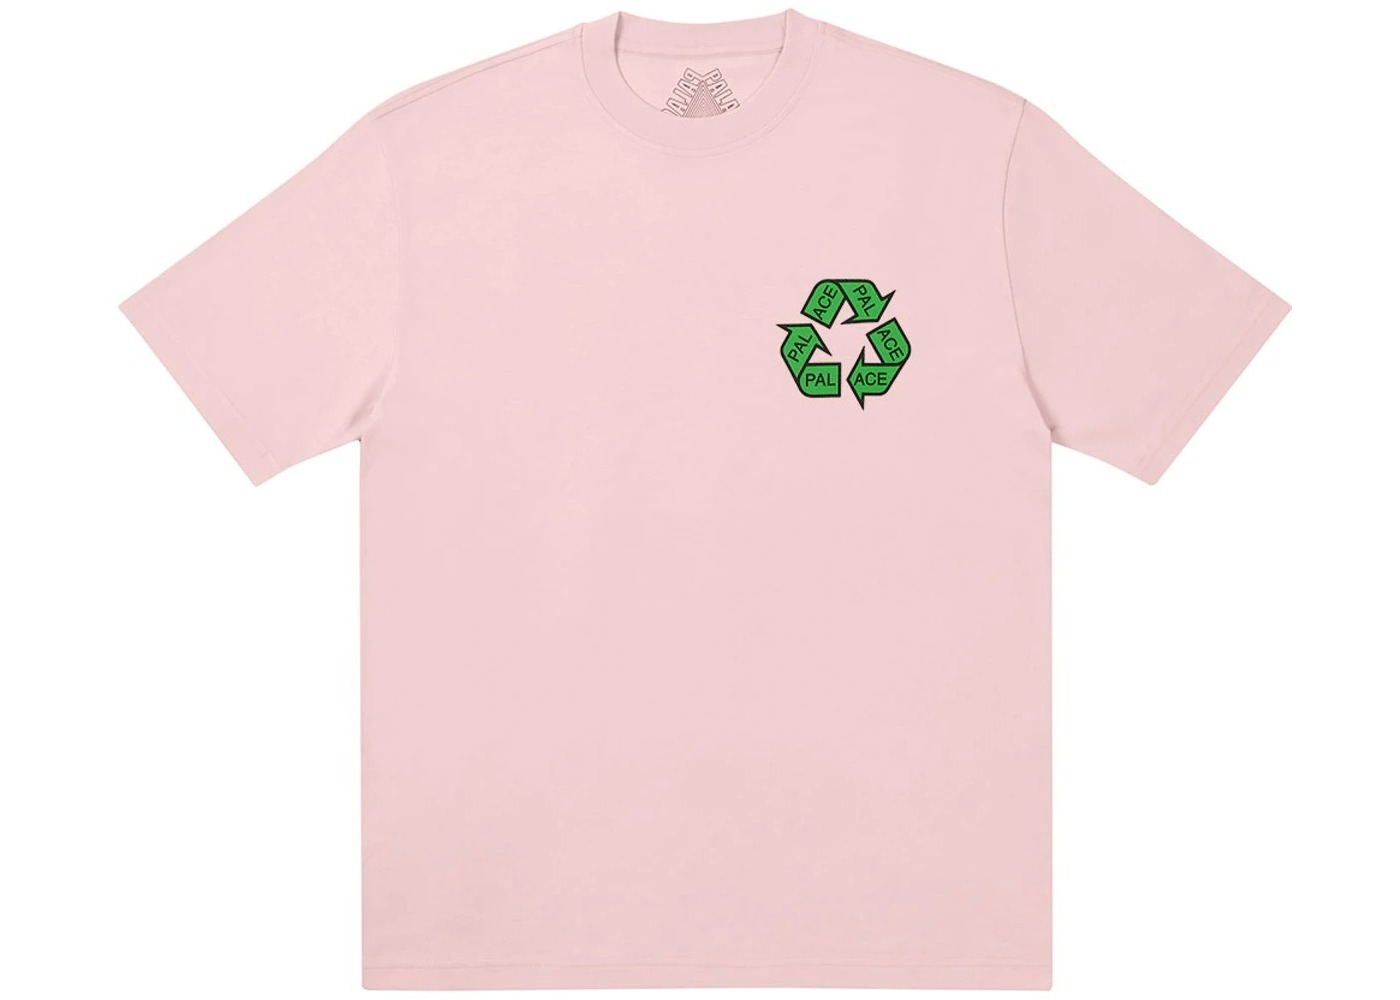 Palace P Cycle T-Shirt Pink (SS21)の写真